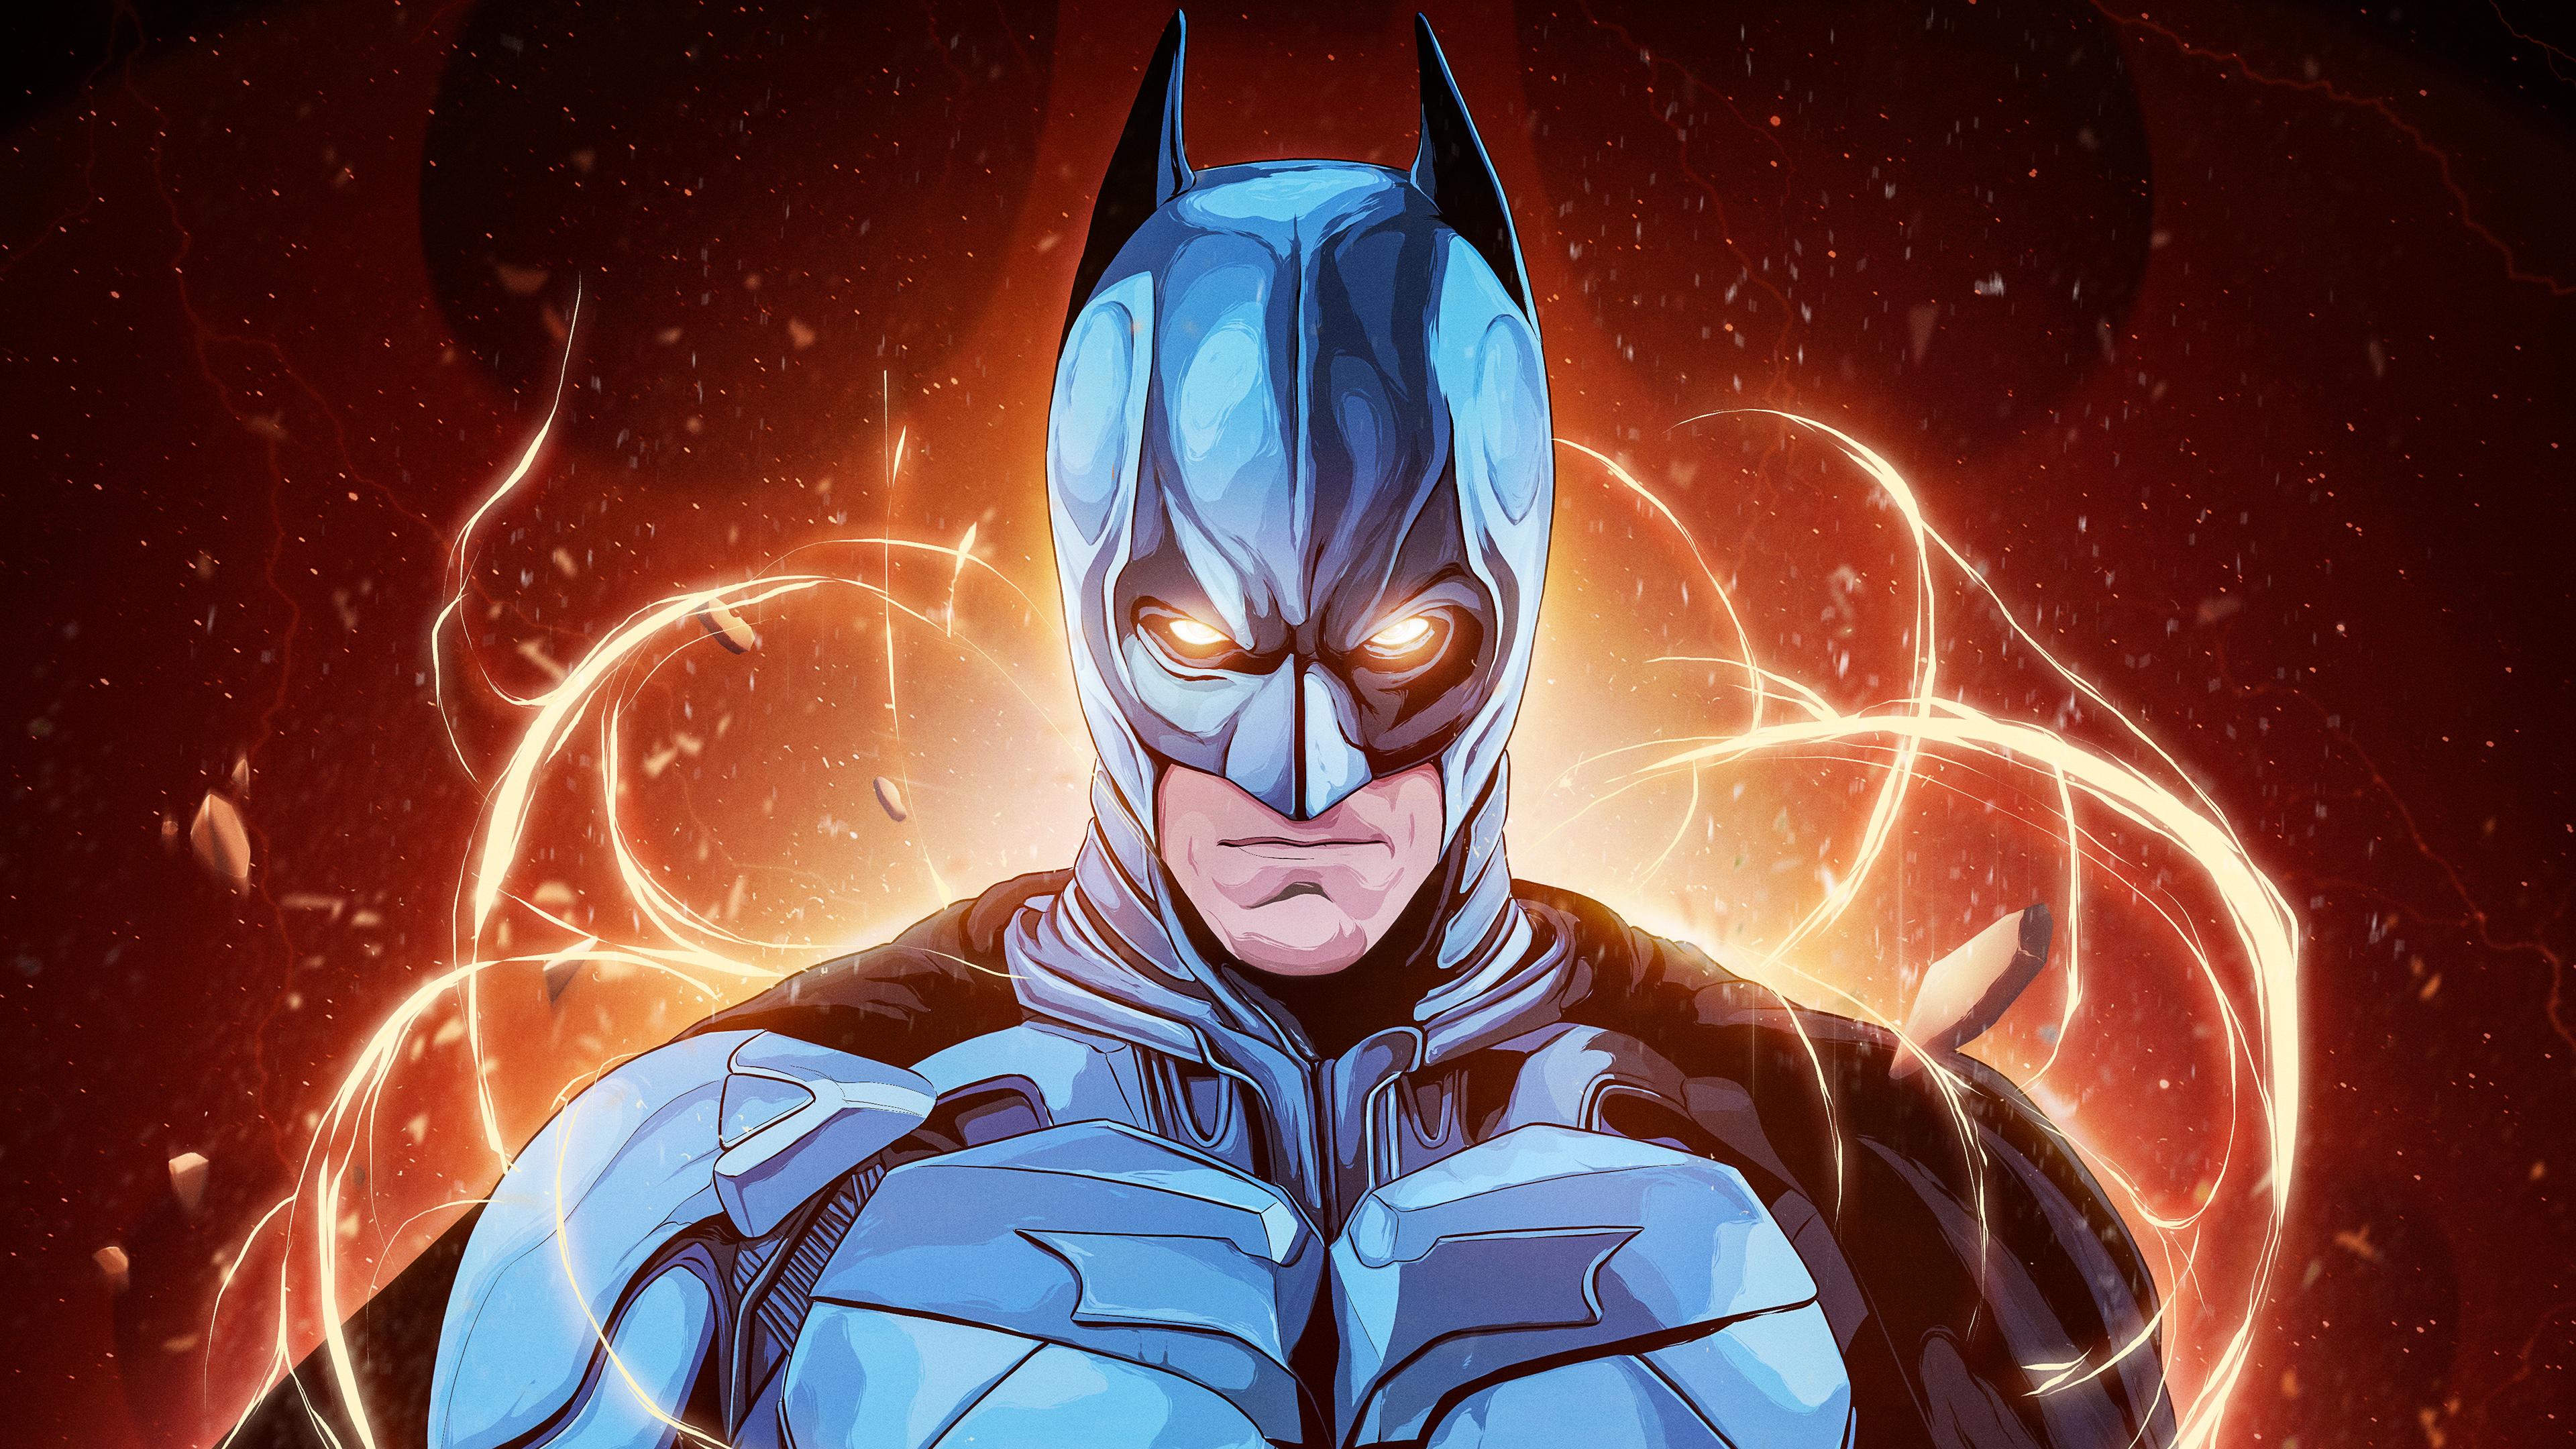 Batman Serious Look 4k Ultra Hd Wallpaper Background Image